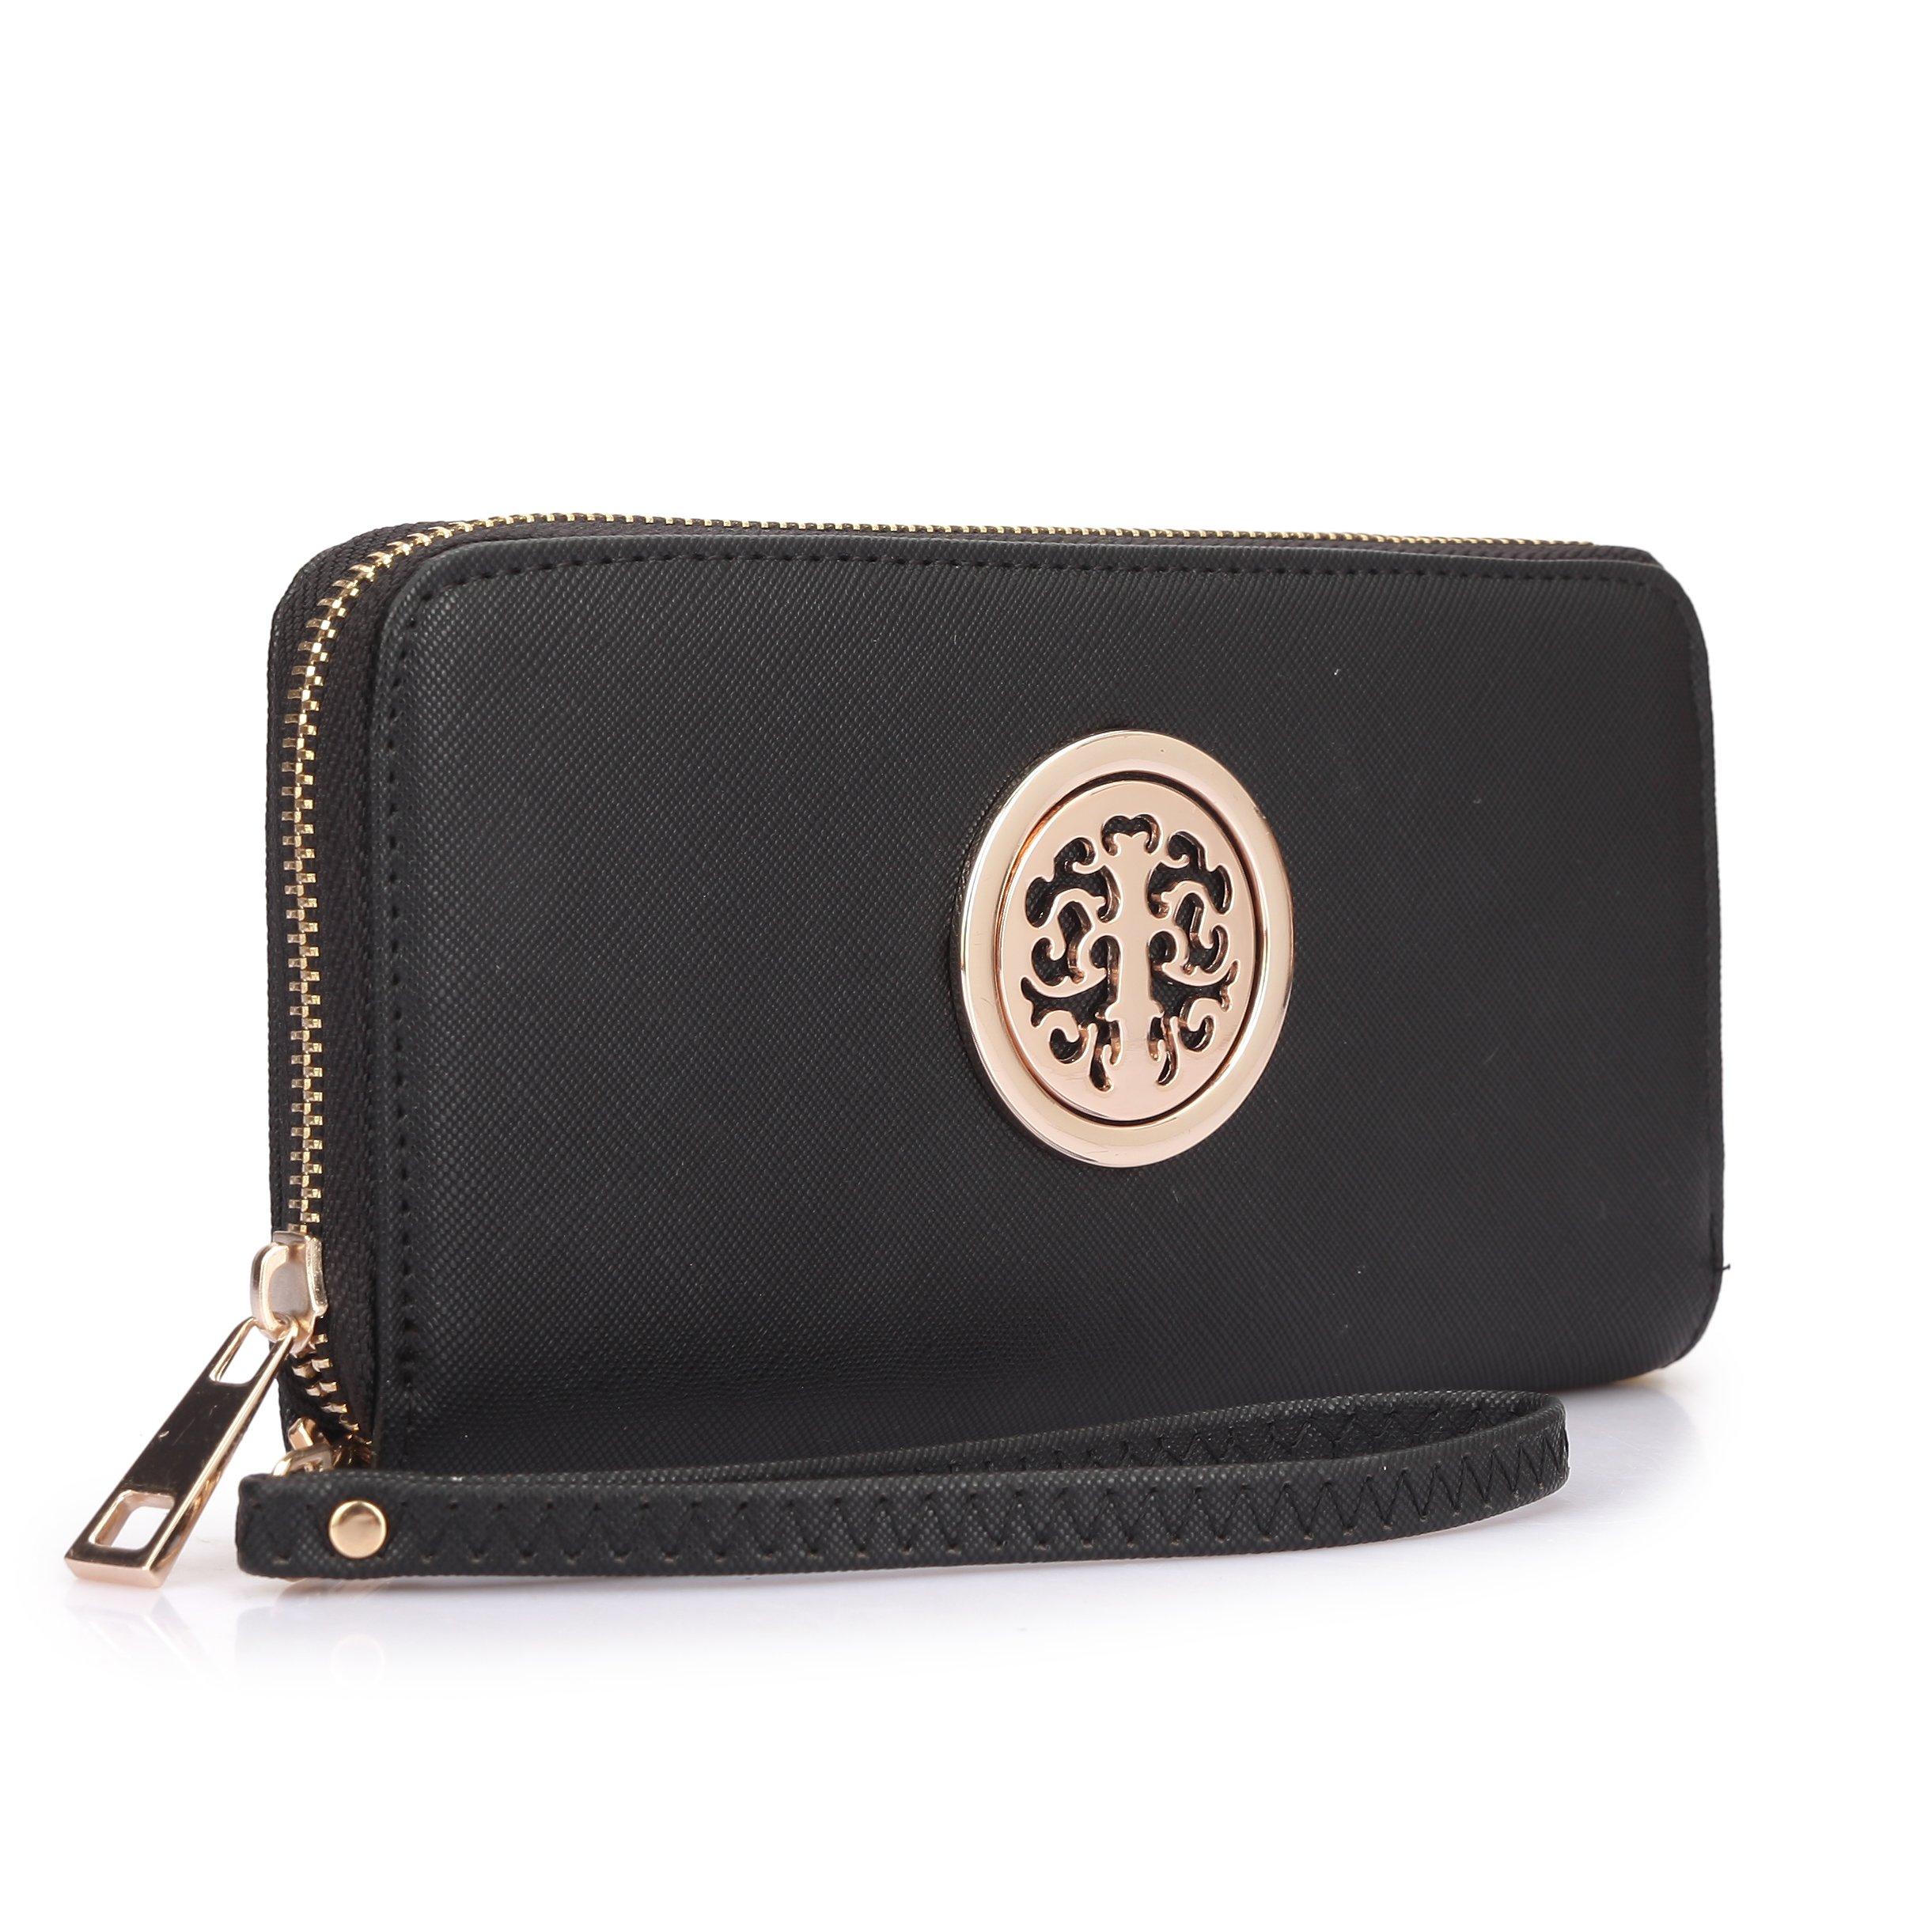 Women Long Wallet Lady Saffiano Leather Wristlet Purse Zipper Organizer Card Cellphone Holder Black by MKY